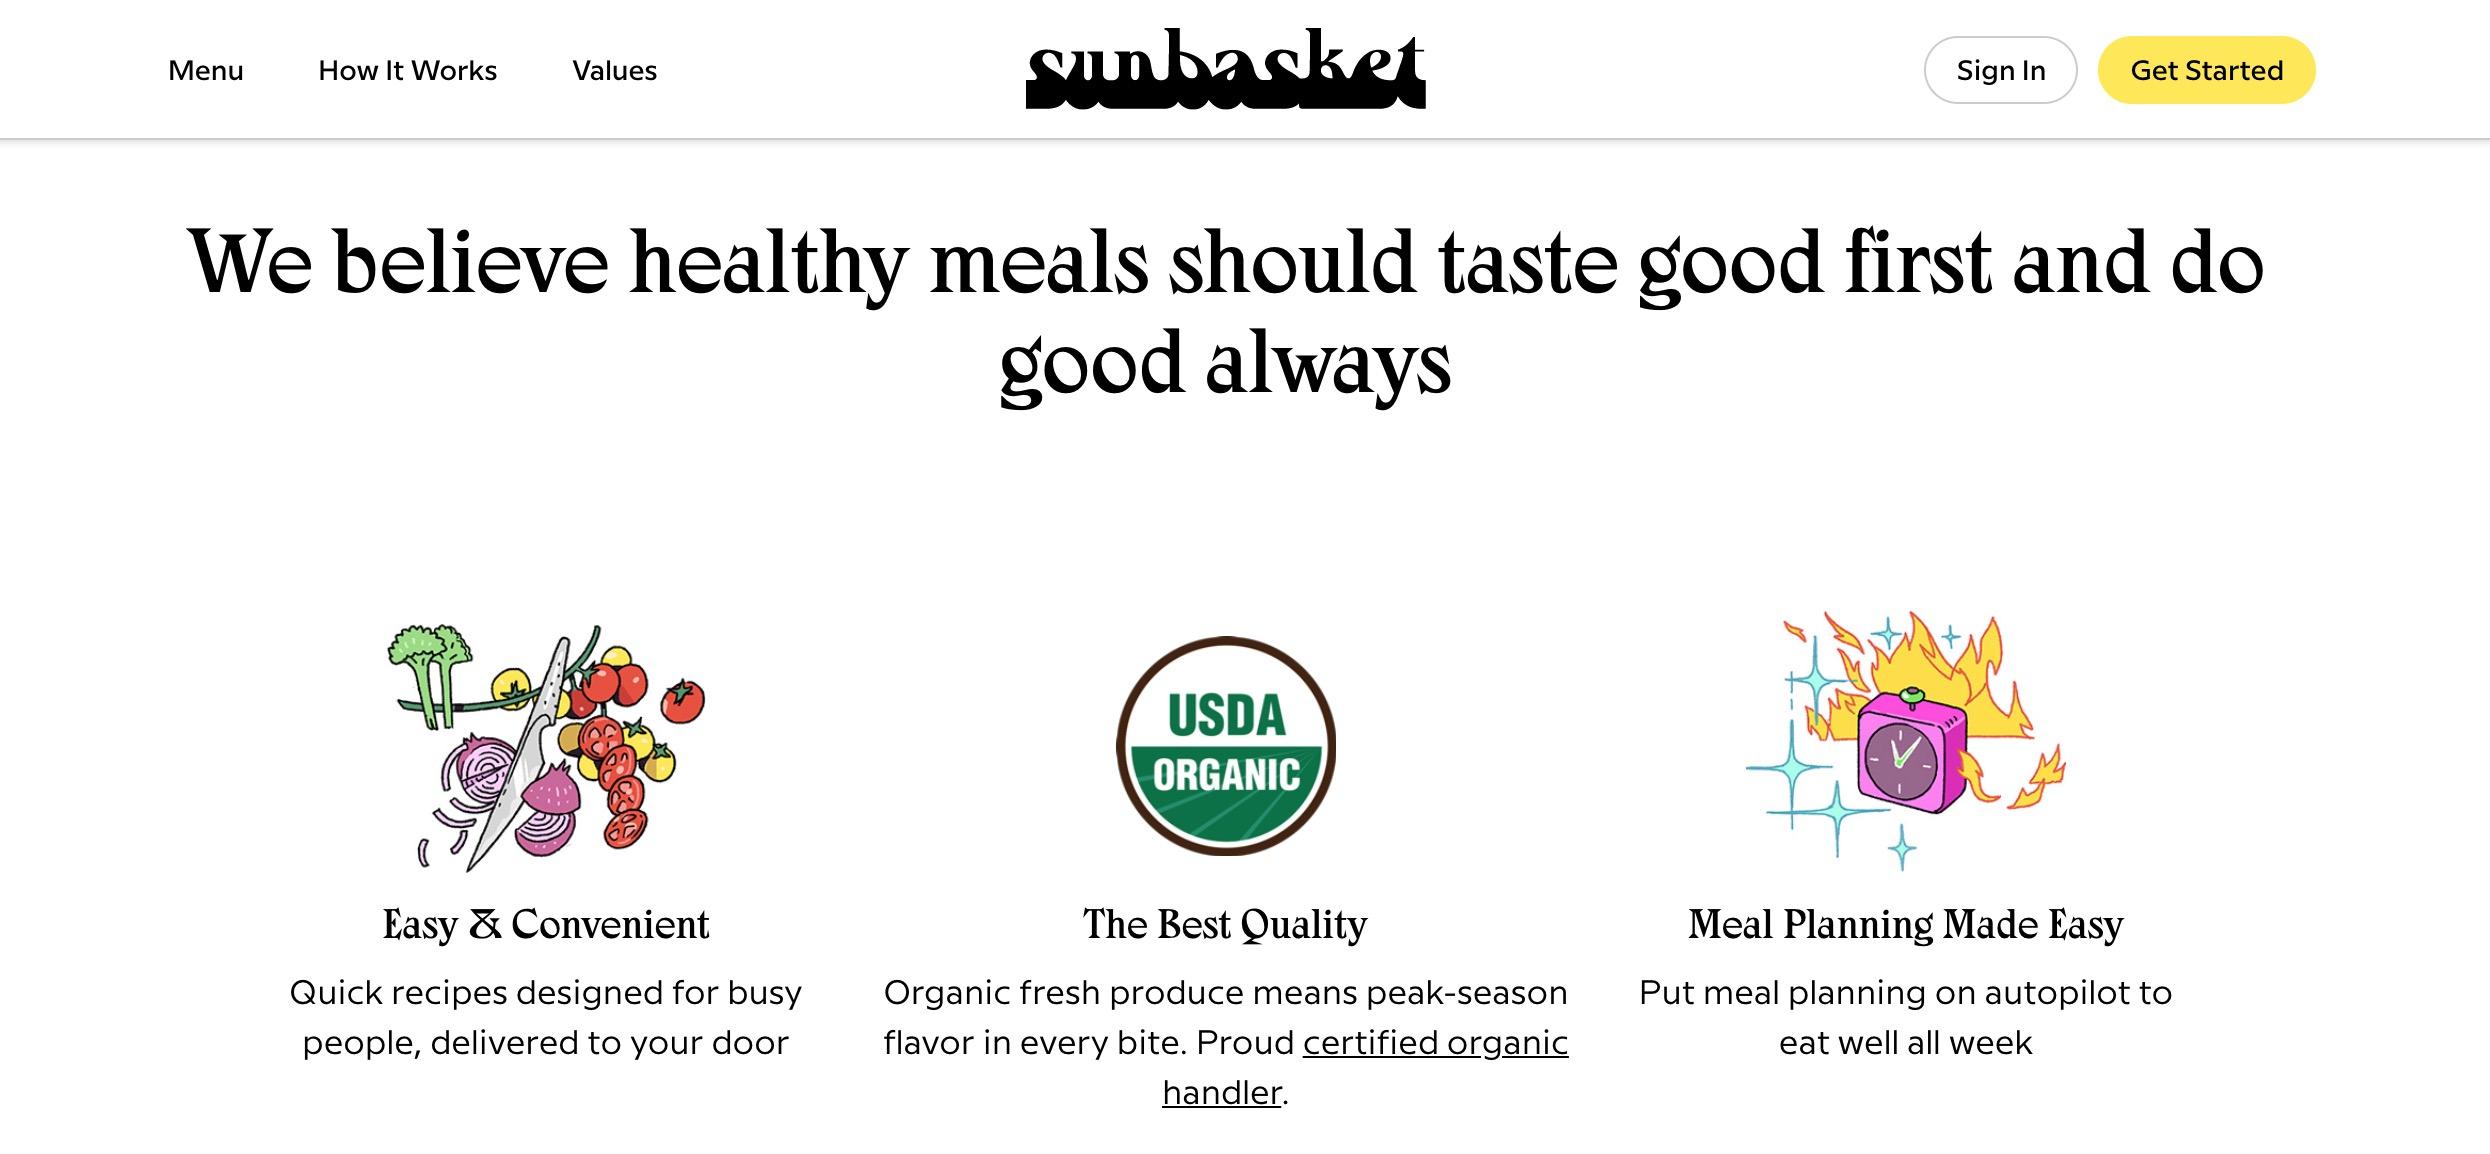 SunBasket features